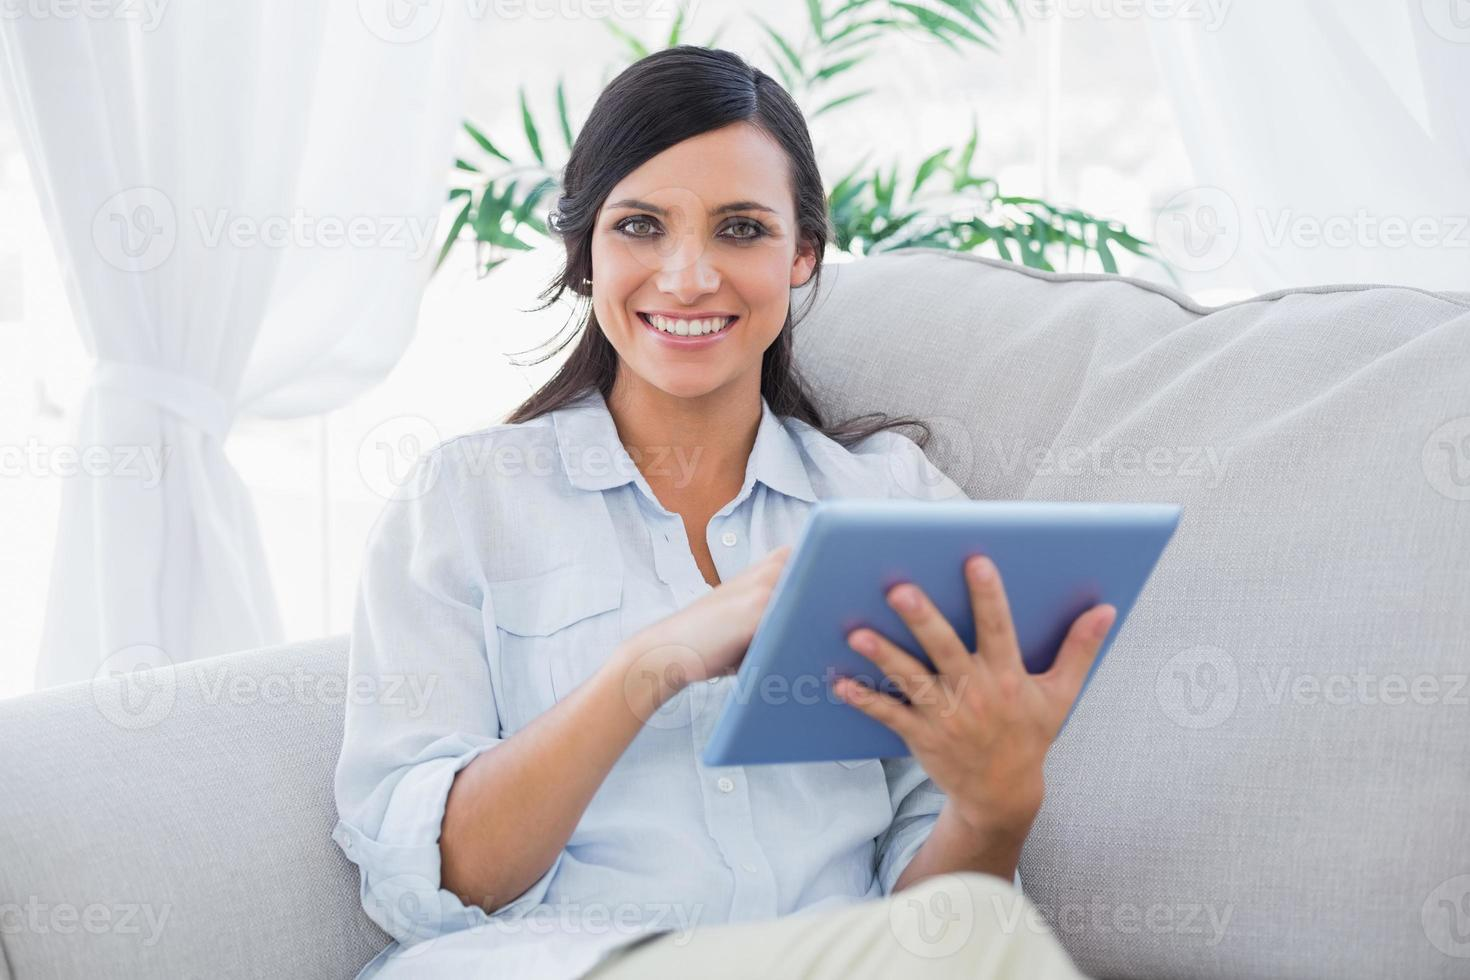 fröhliche Brünette mit Tablet-PC foto